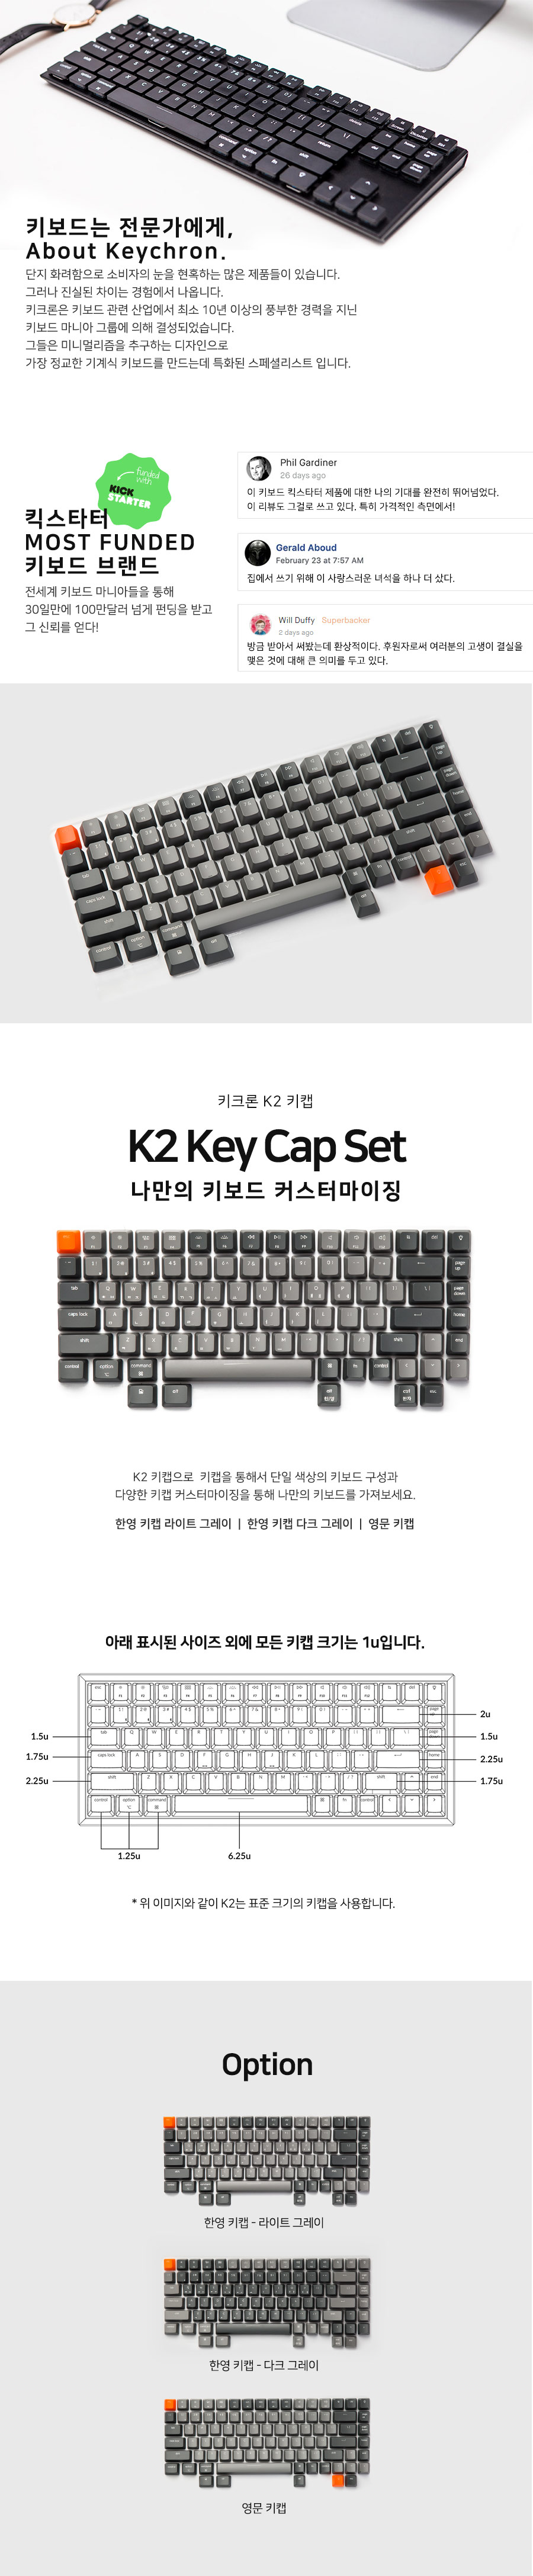 Keychron  K2용 영문 키캡(라이트그레이)